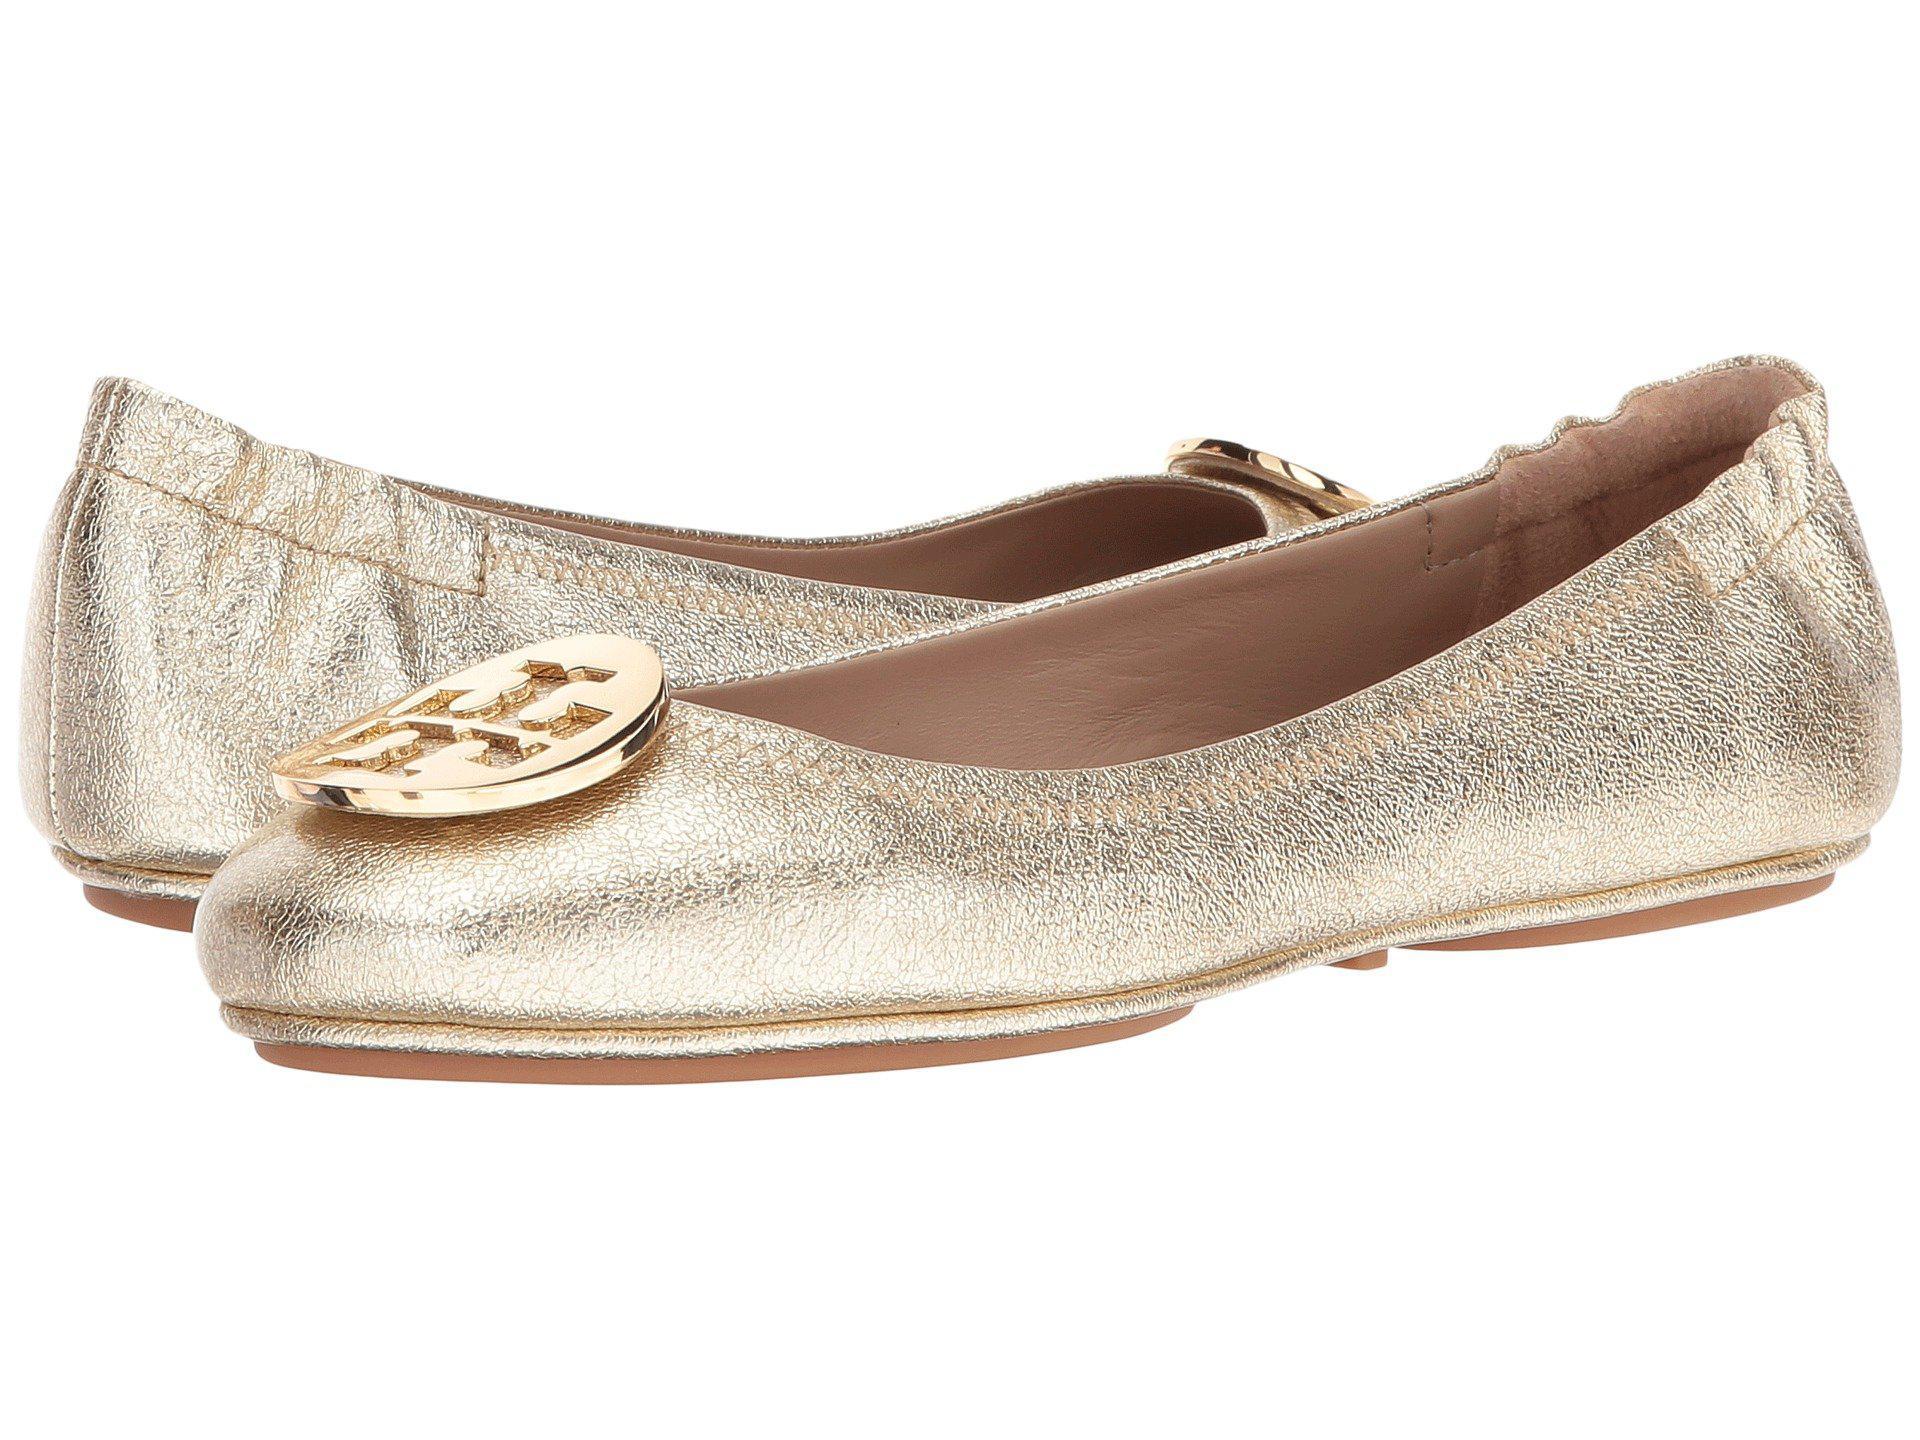 be5df9ee2b3b9 Lyst - Tory Burch Minnie Travel Ballet Flat (black gold) Women s Shoes